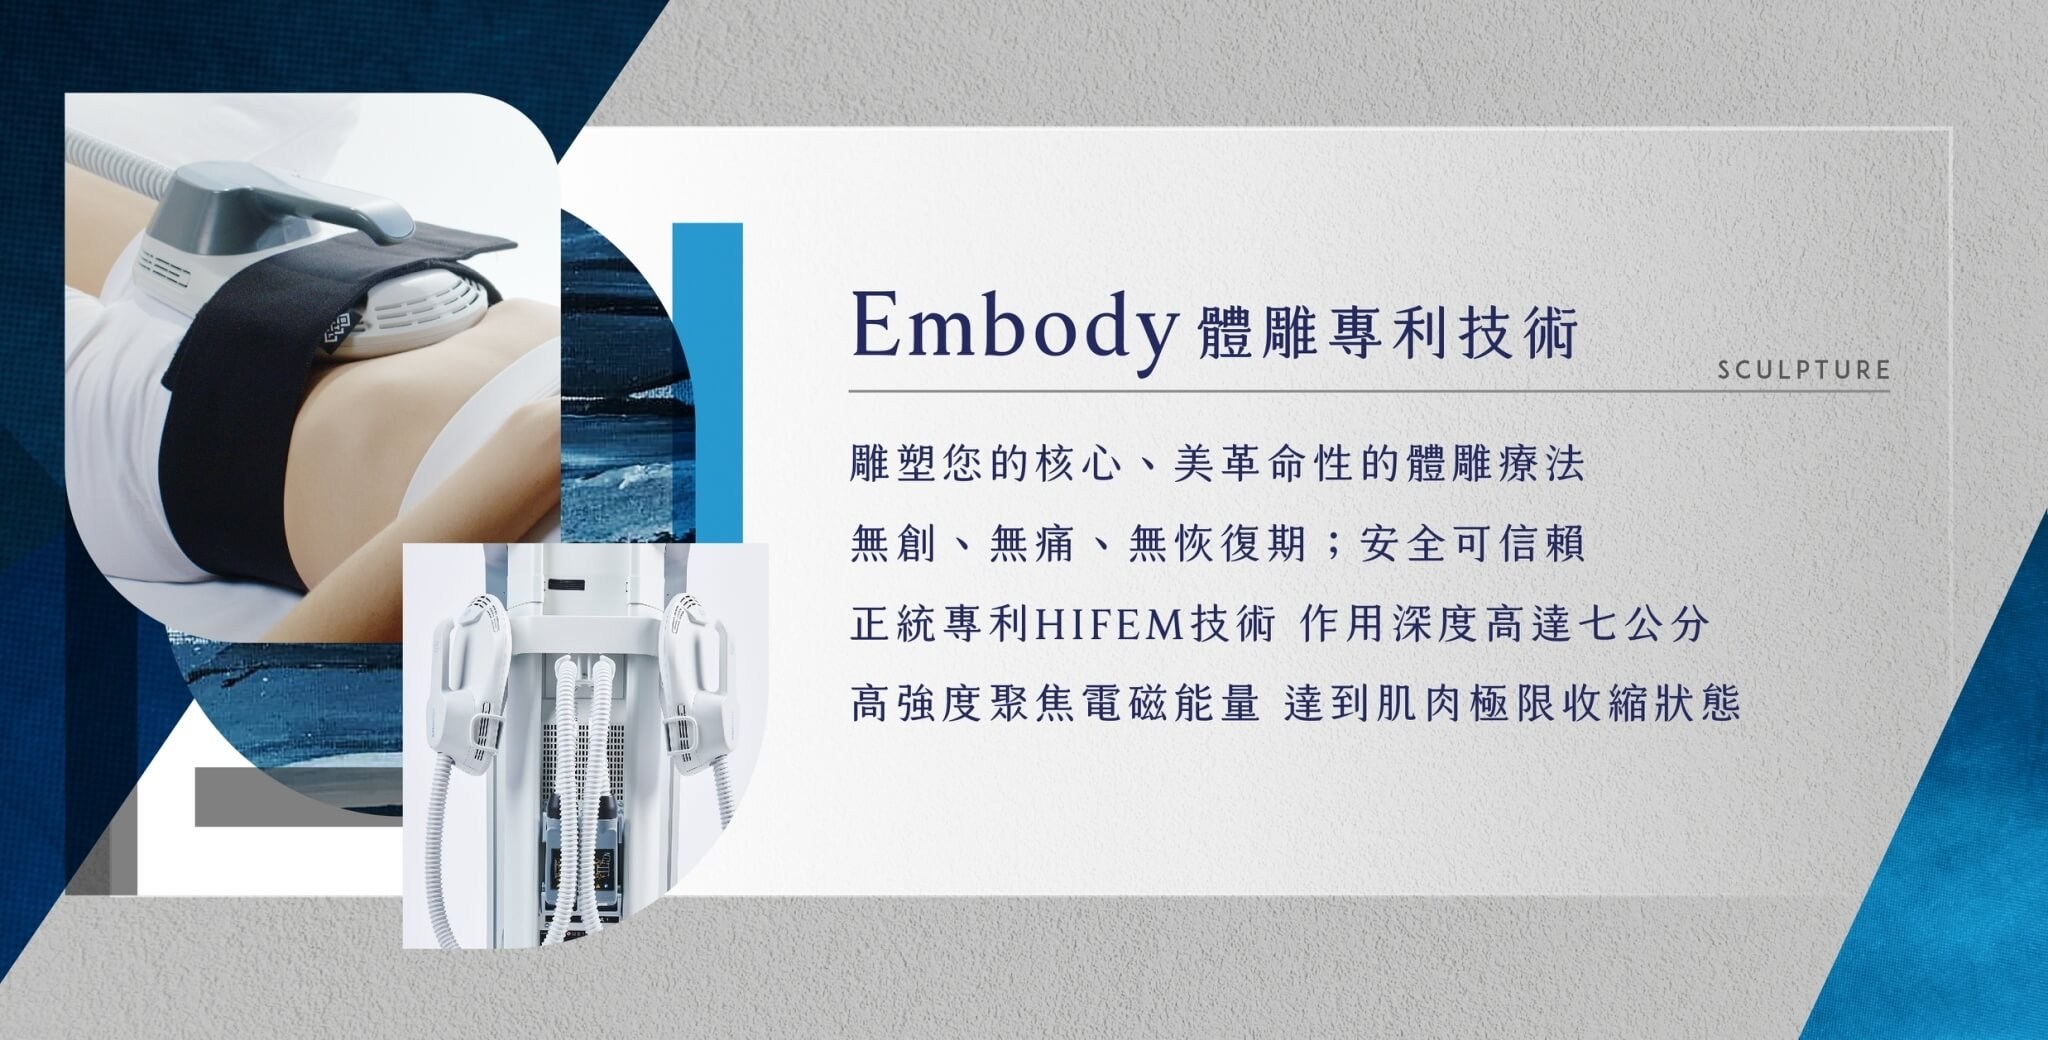 Embody體雕專利技術